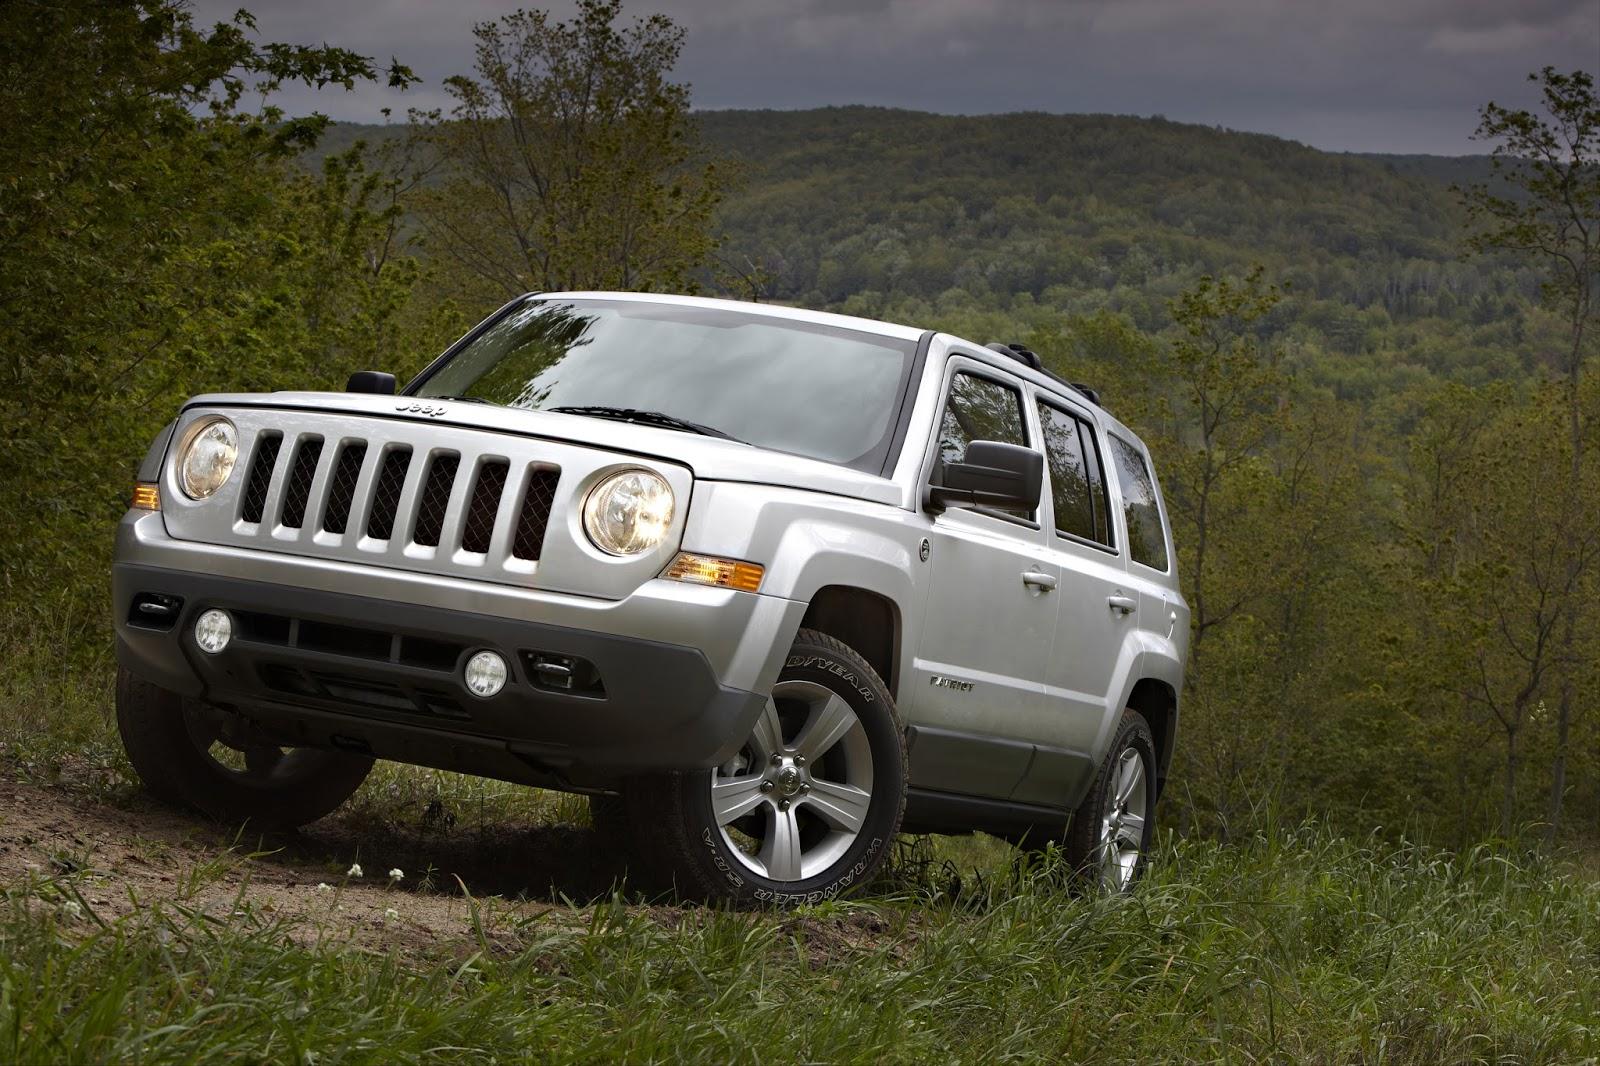 new car review 2013 jeep patriot latitude 4x4. Black Bedroom Furniture Sets. Home Design Ideas